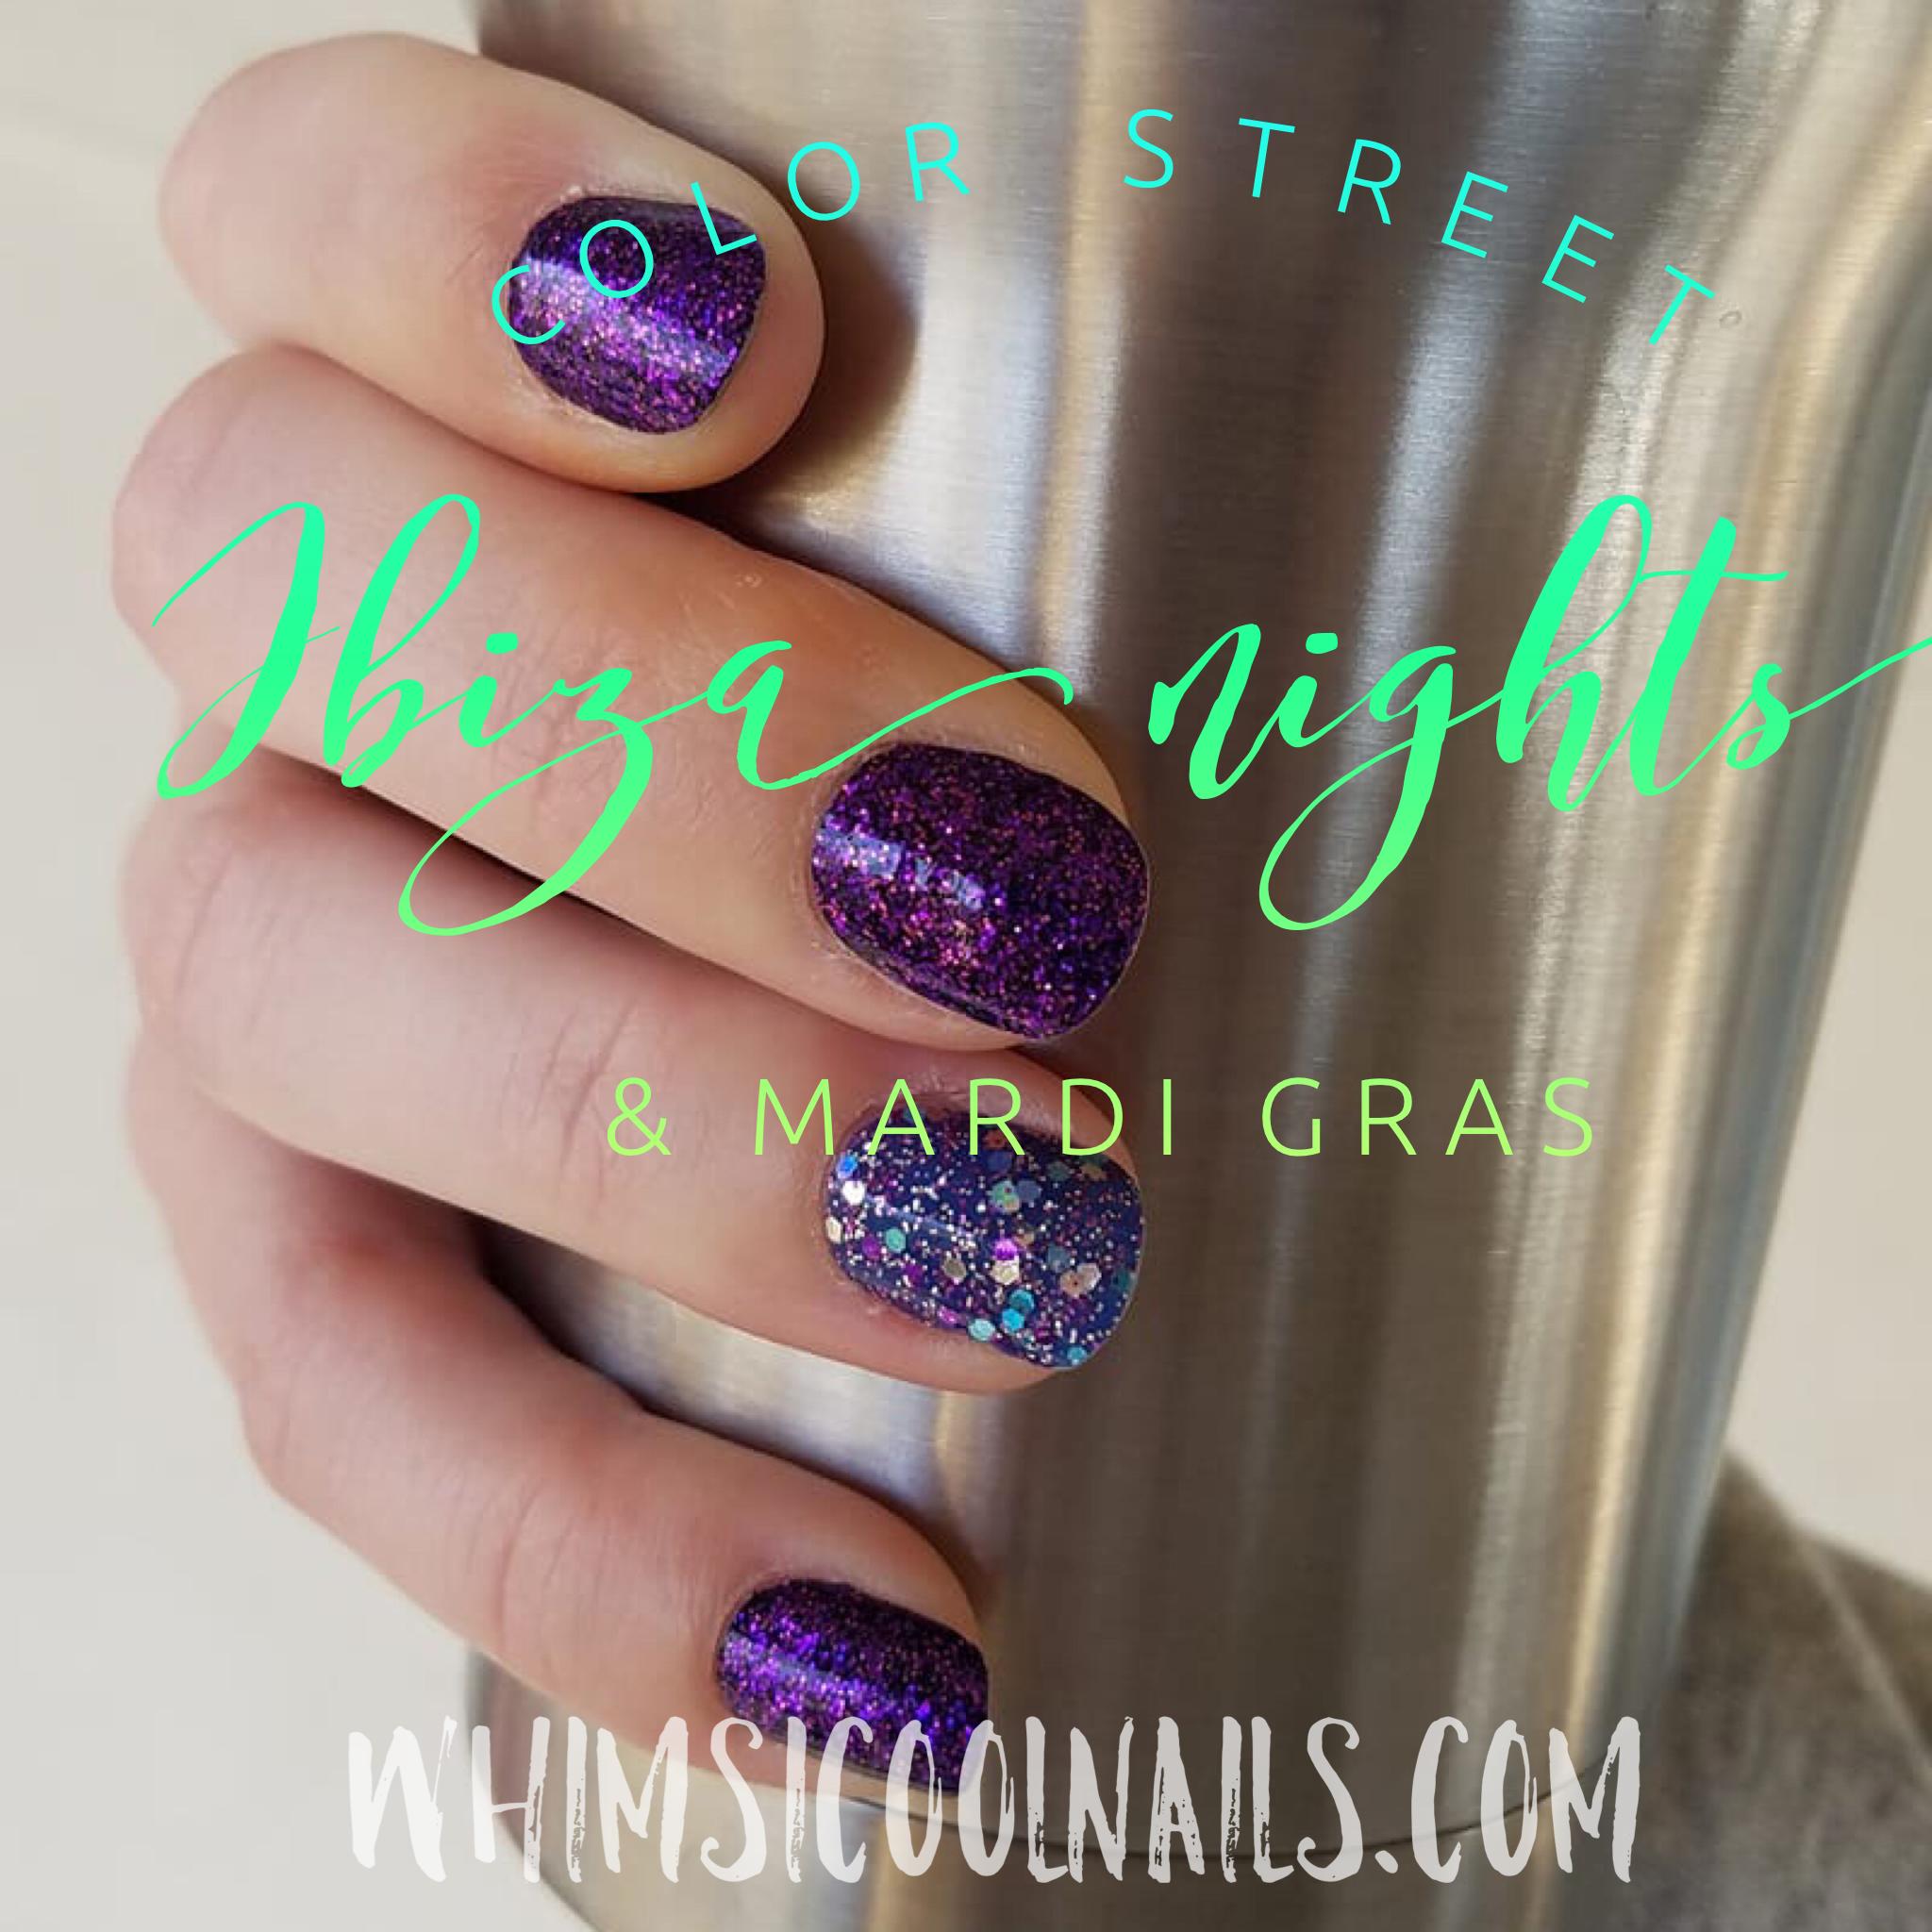 Ibiza Nights & Mardi Gras / Color Street nail polish strips | color ...